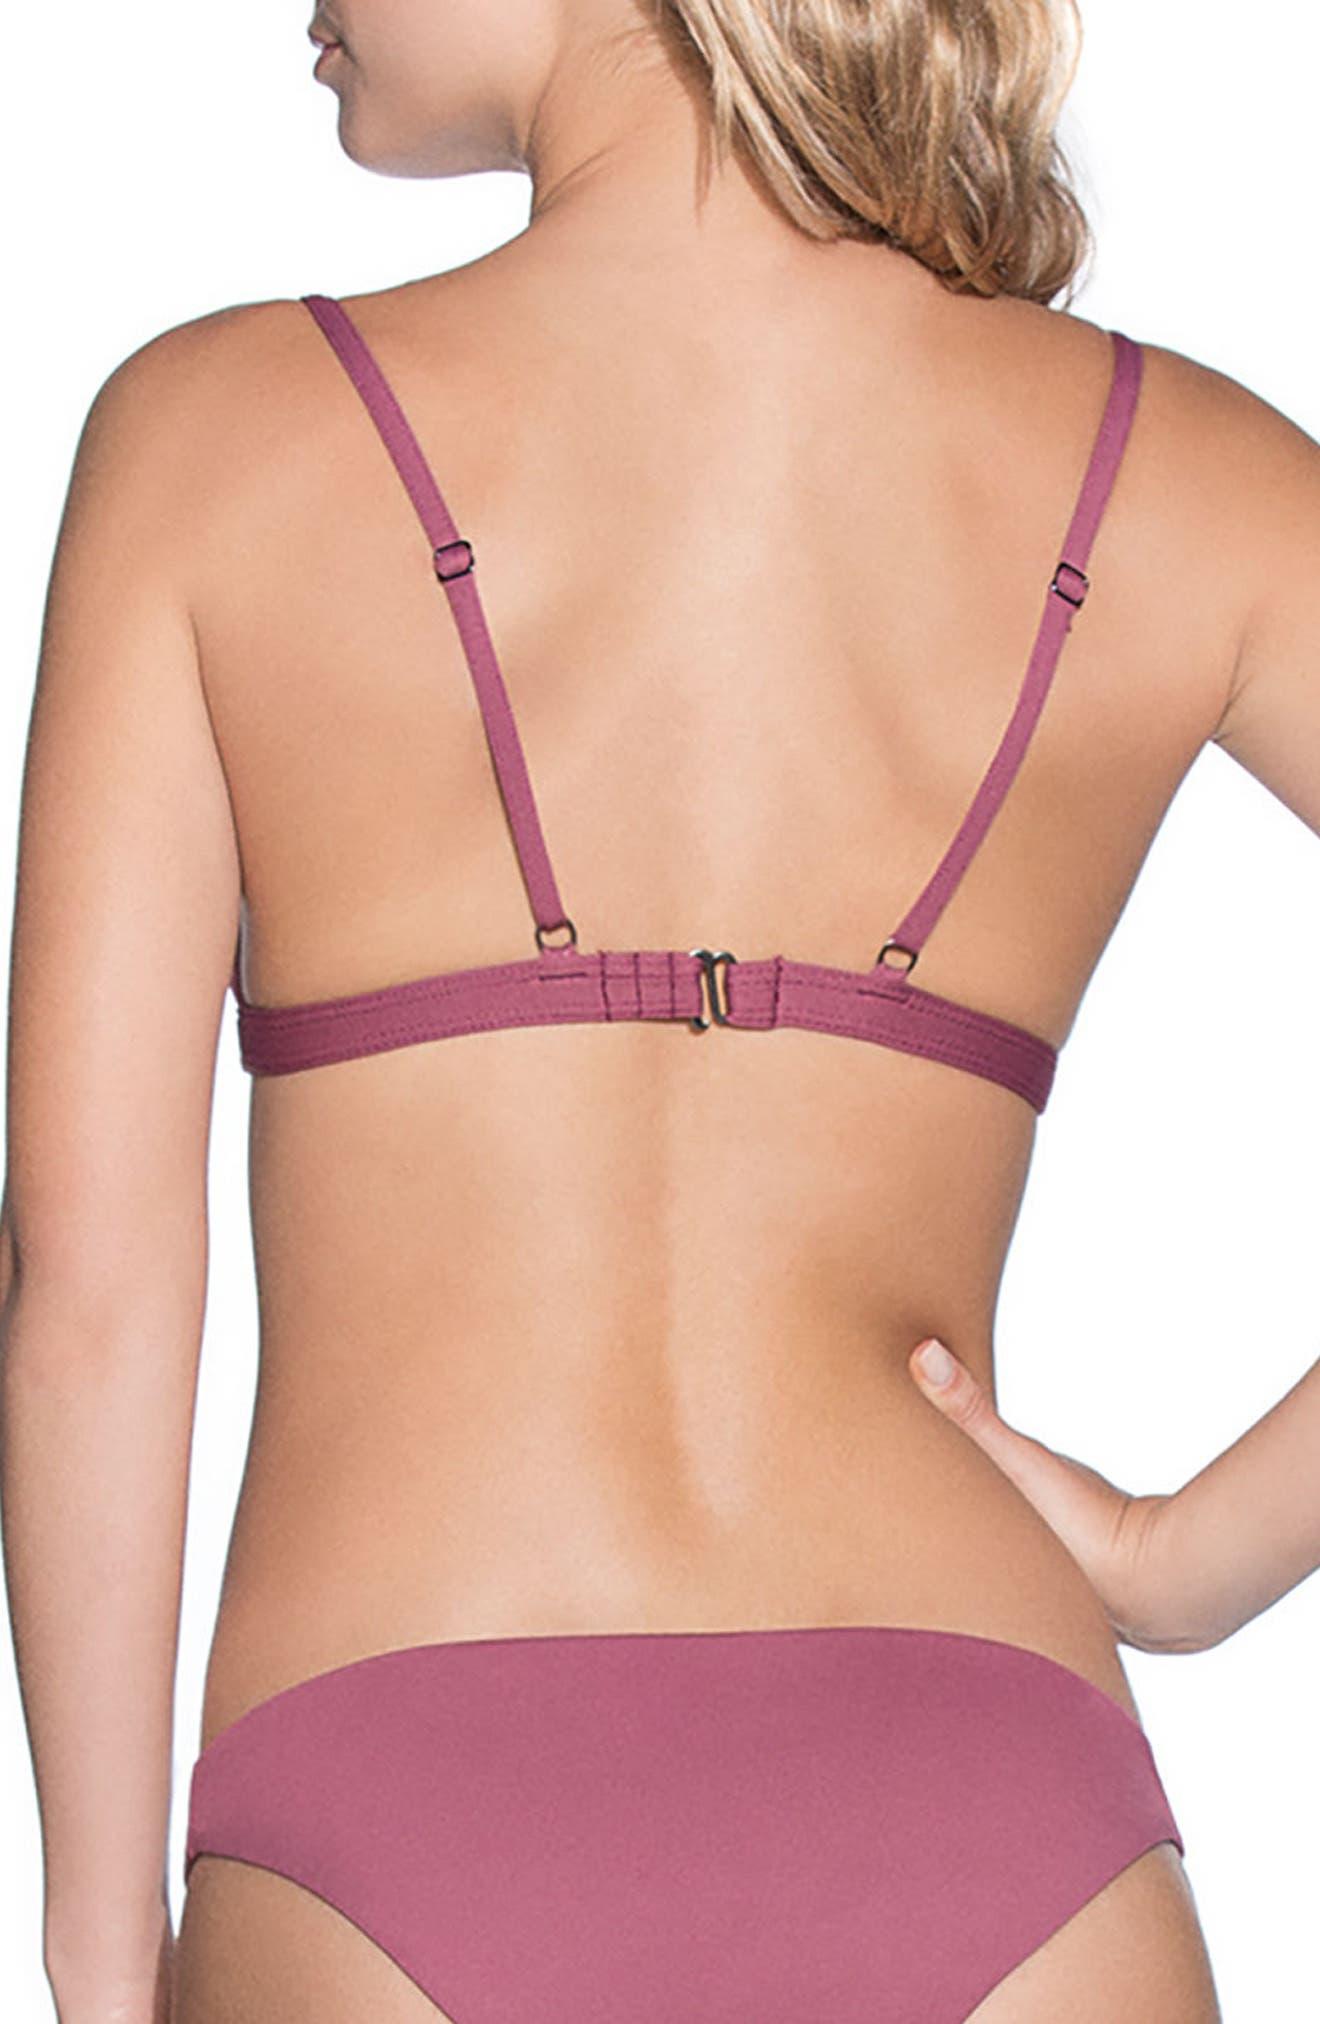 Alternate Image 3  - Maaji Juneberry Delightful Reversible Bikini Top